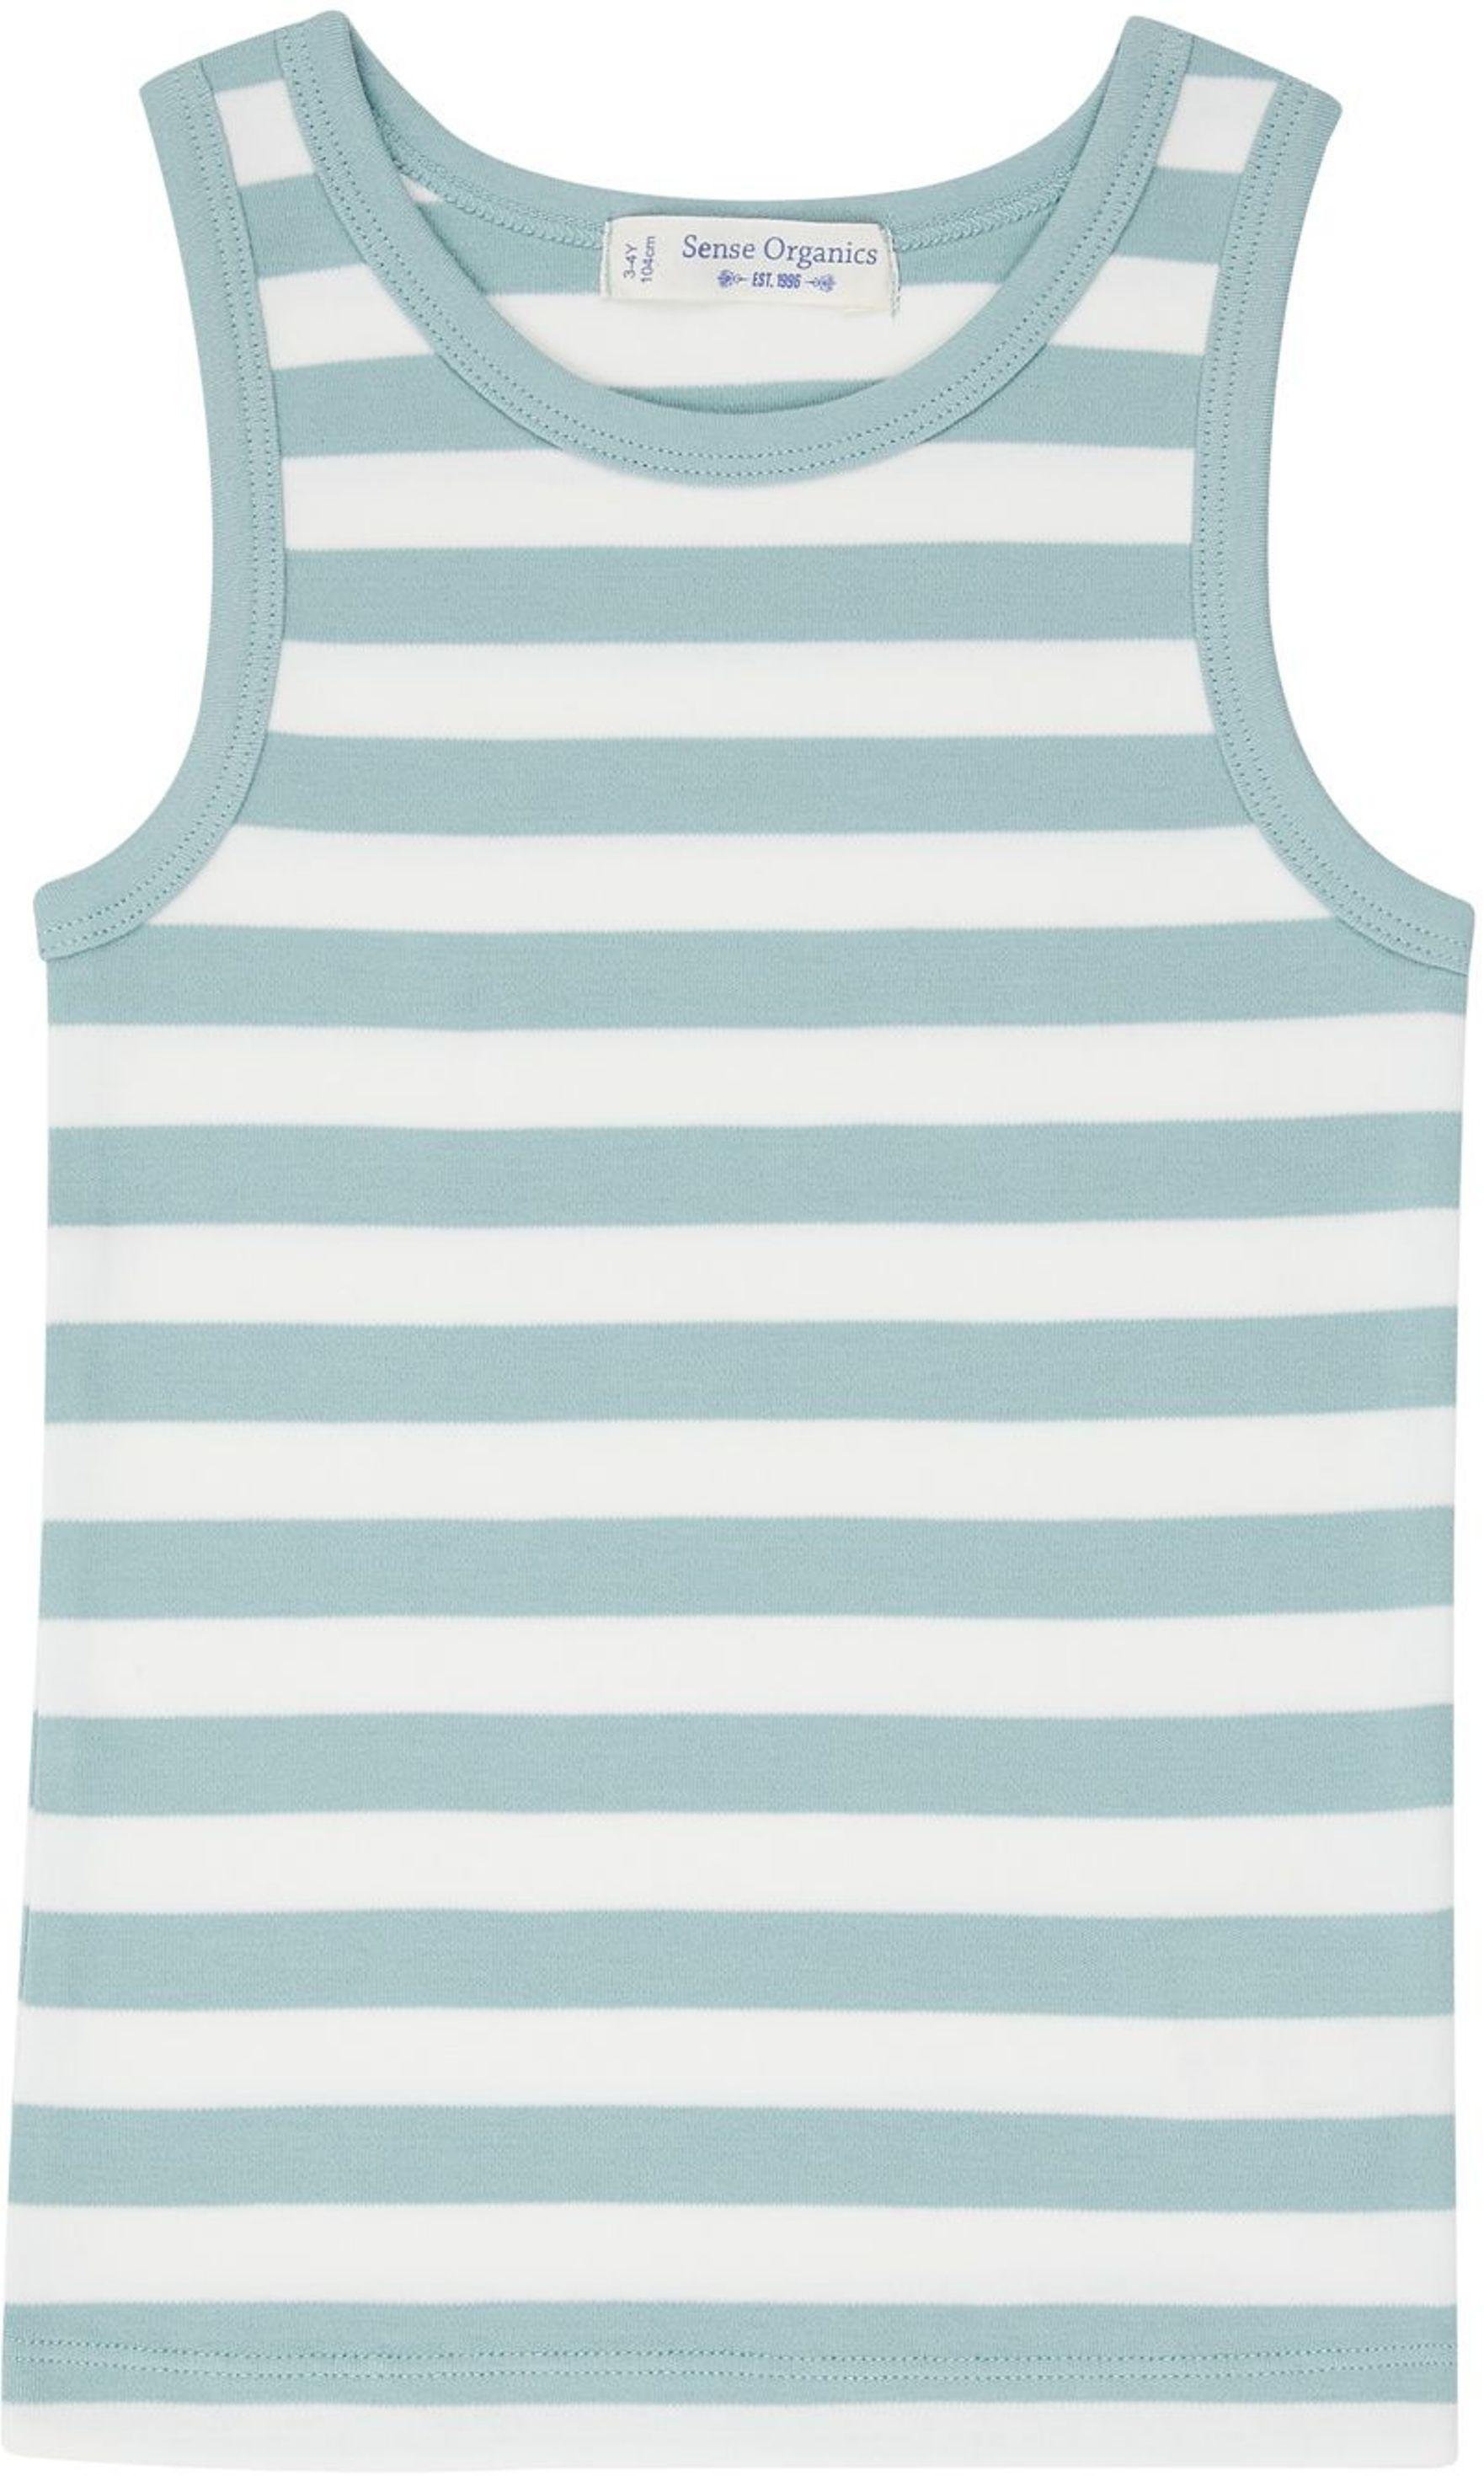 Sense Organic DON Unterhemd aqua/stripes